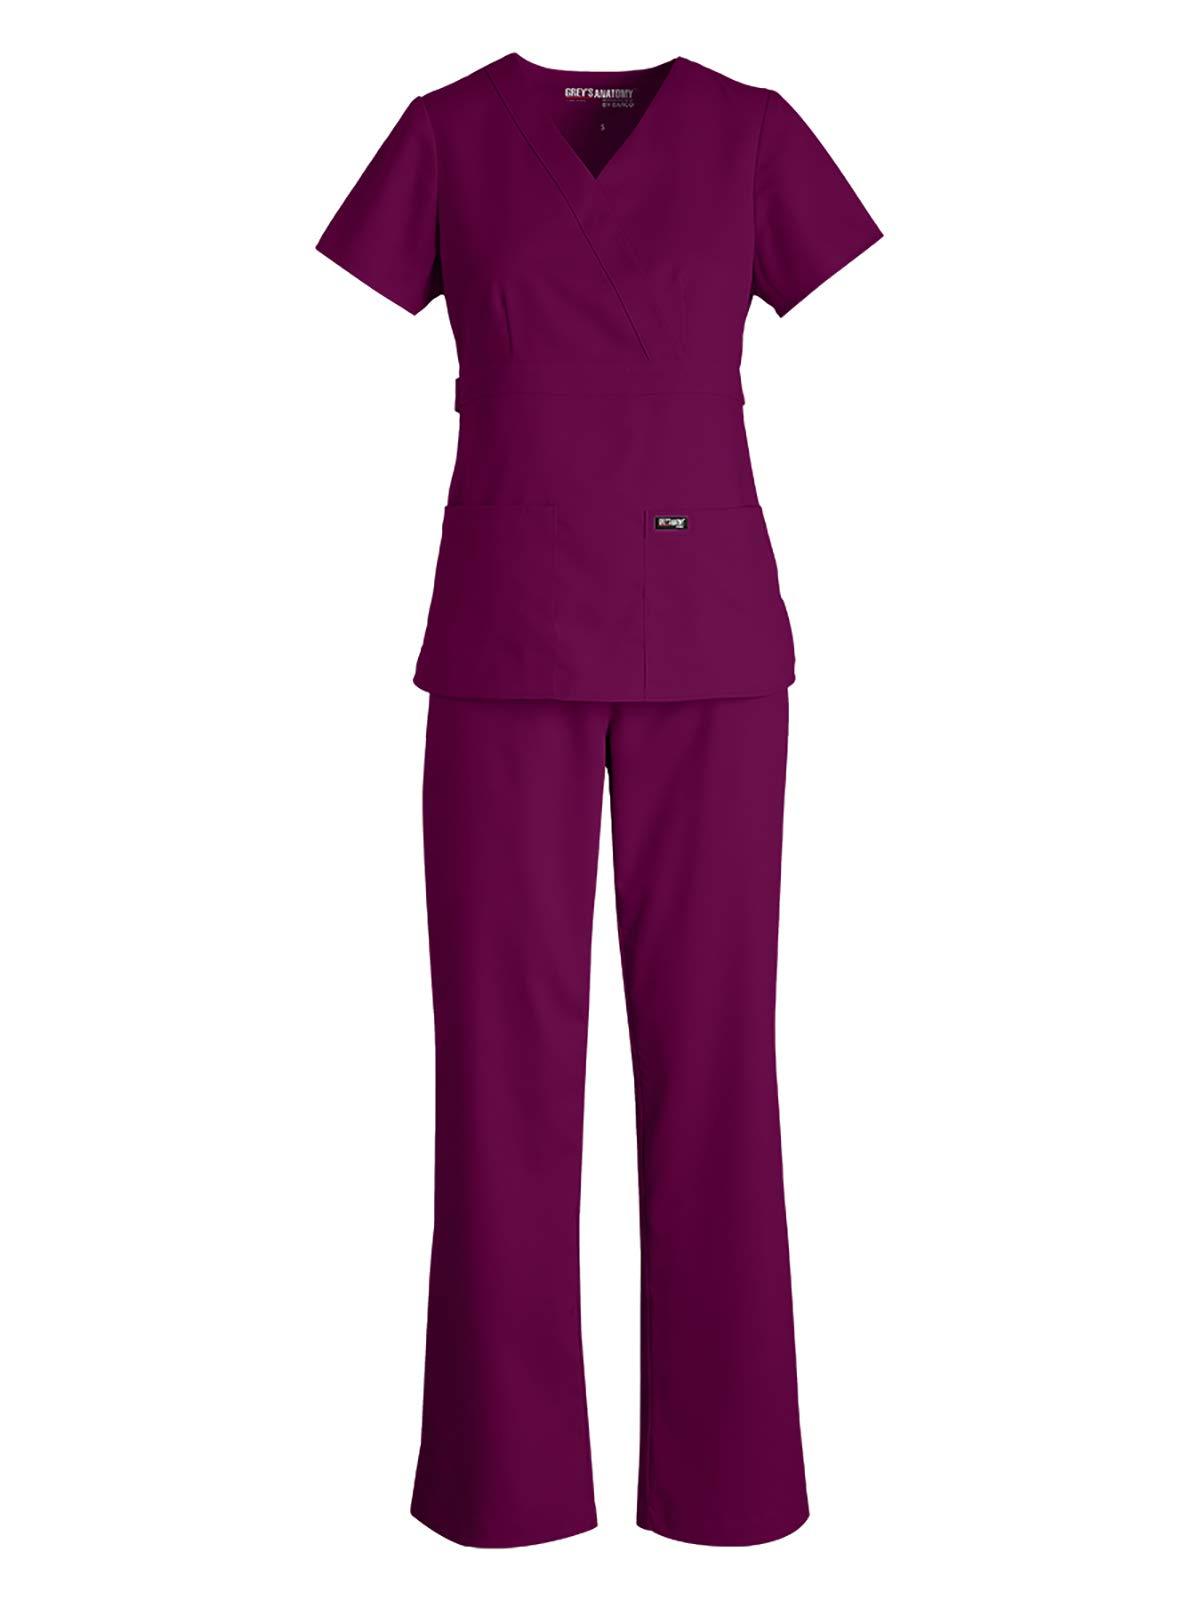 Grey's Anatomy Bundle – 3 Pocket Top with 5 Pocket Pant Medical Scrub Set for Women